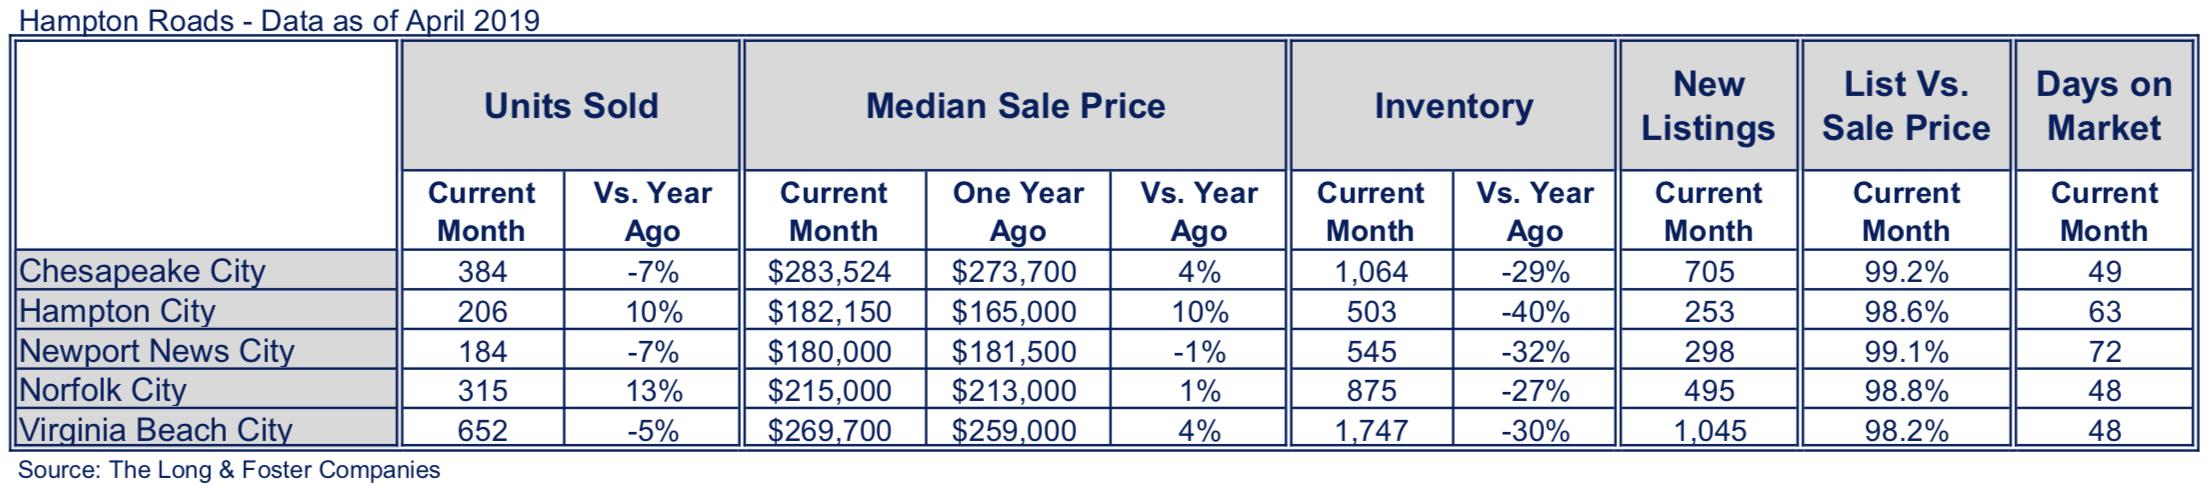 Hampton Roads Market Minute Chart April 2019